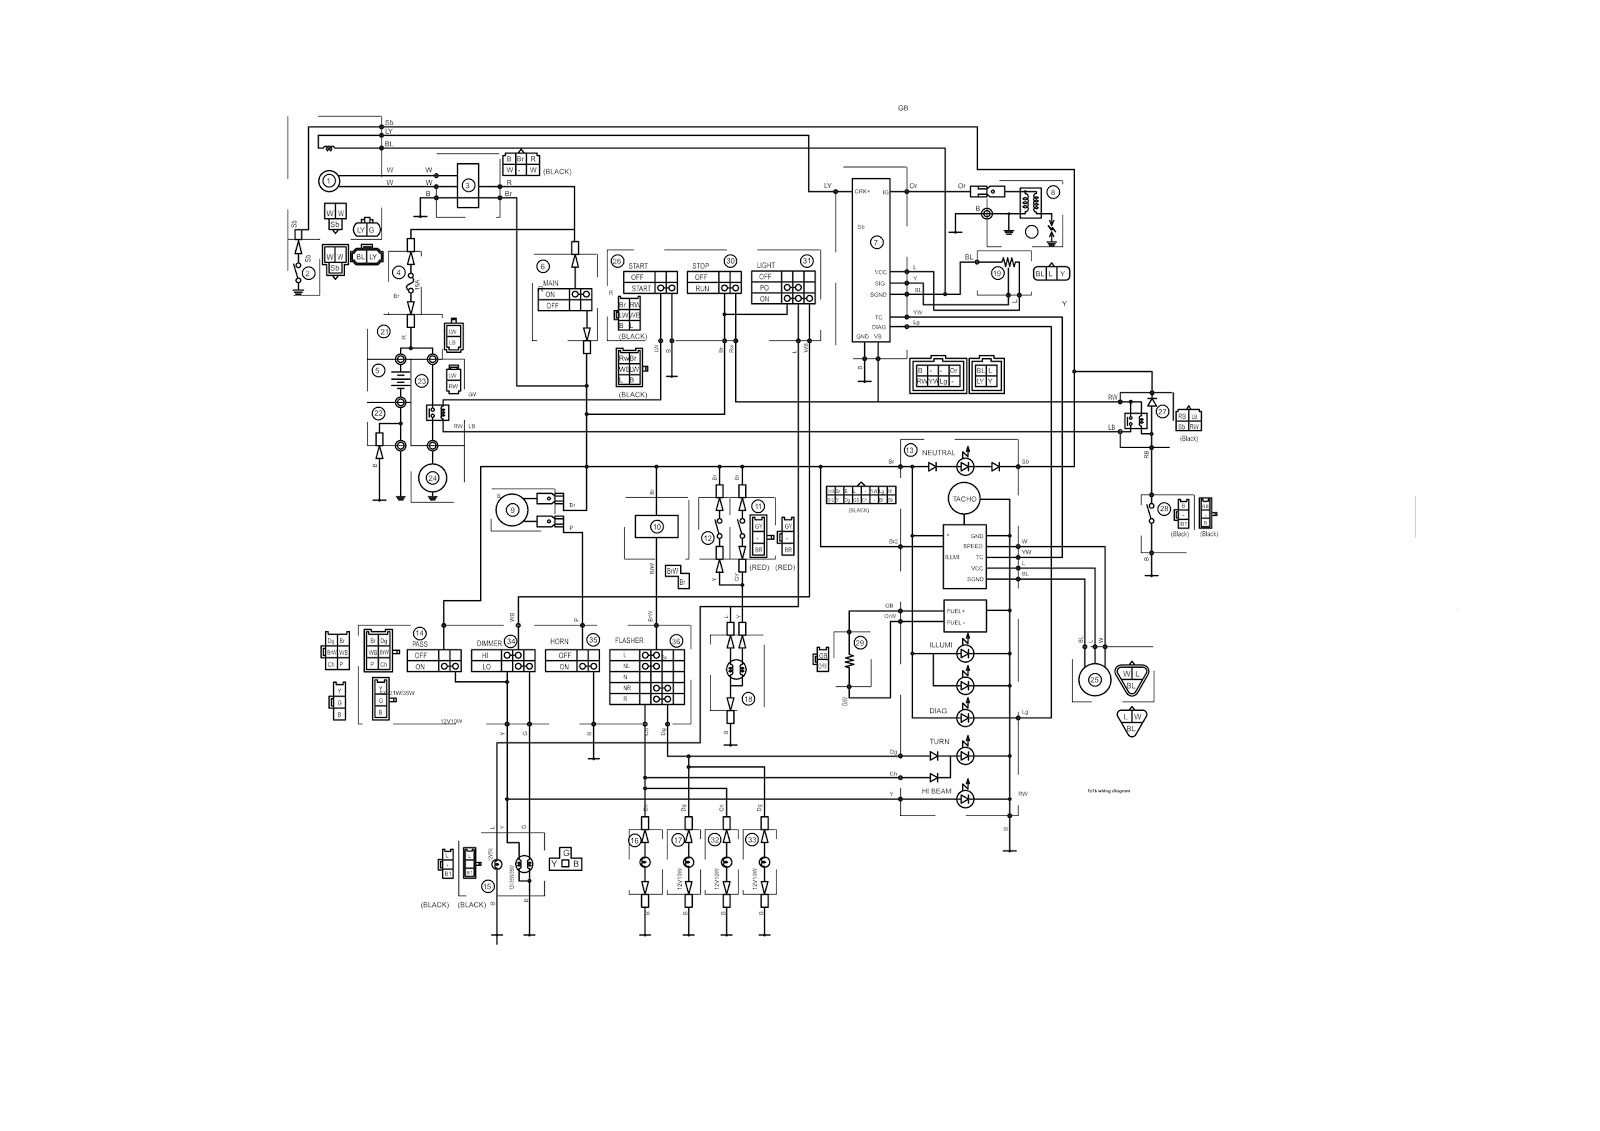 Mio Engine Schematics Electrical Wiring Diagrams Diagram Motor For Light Switch U2022 Ford 73 Diesel